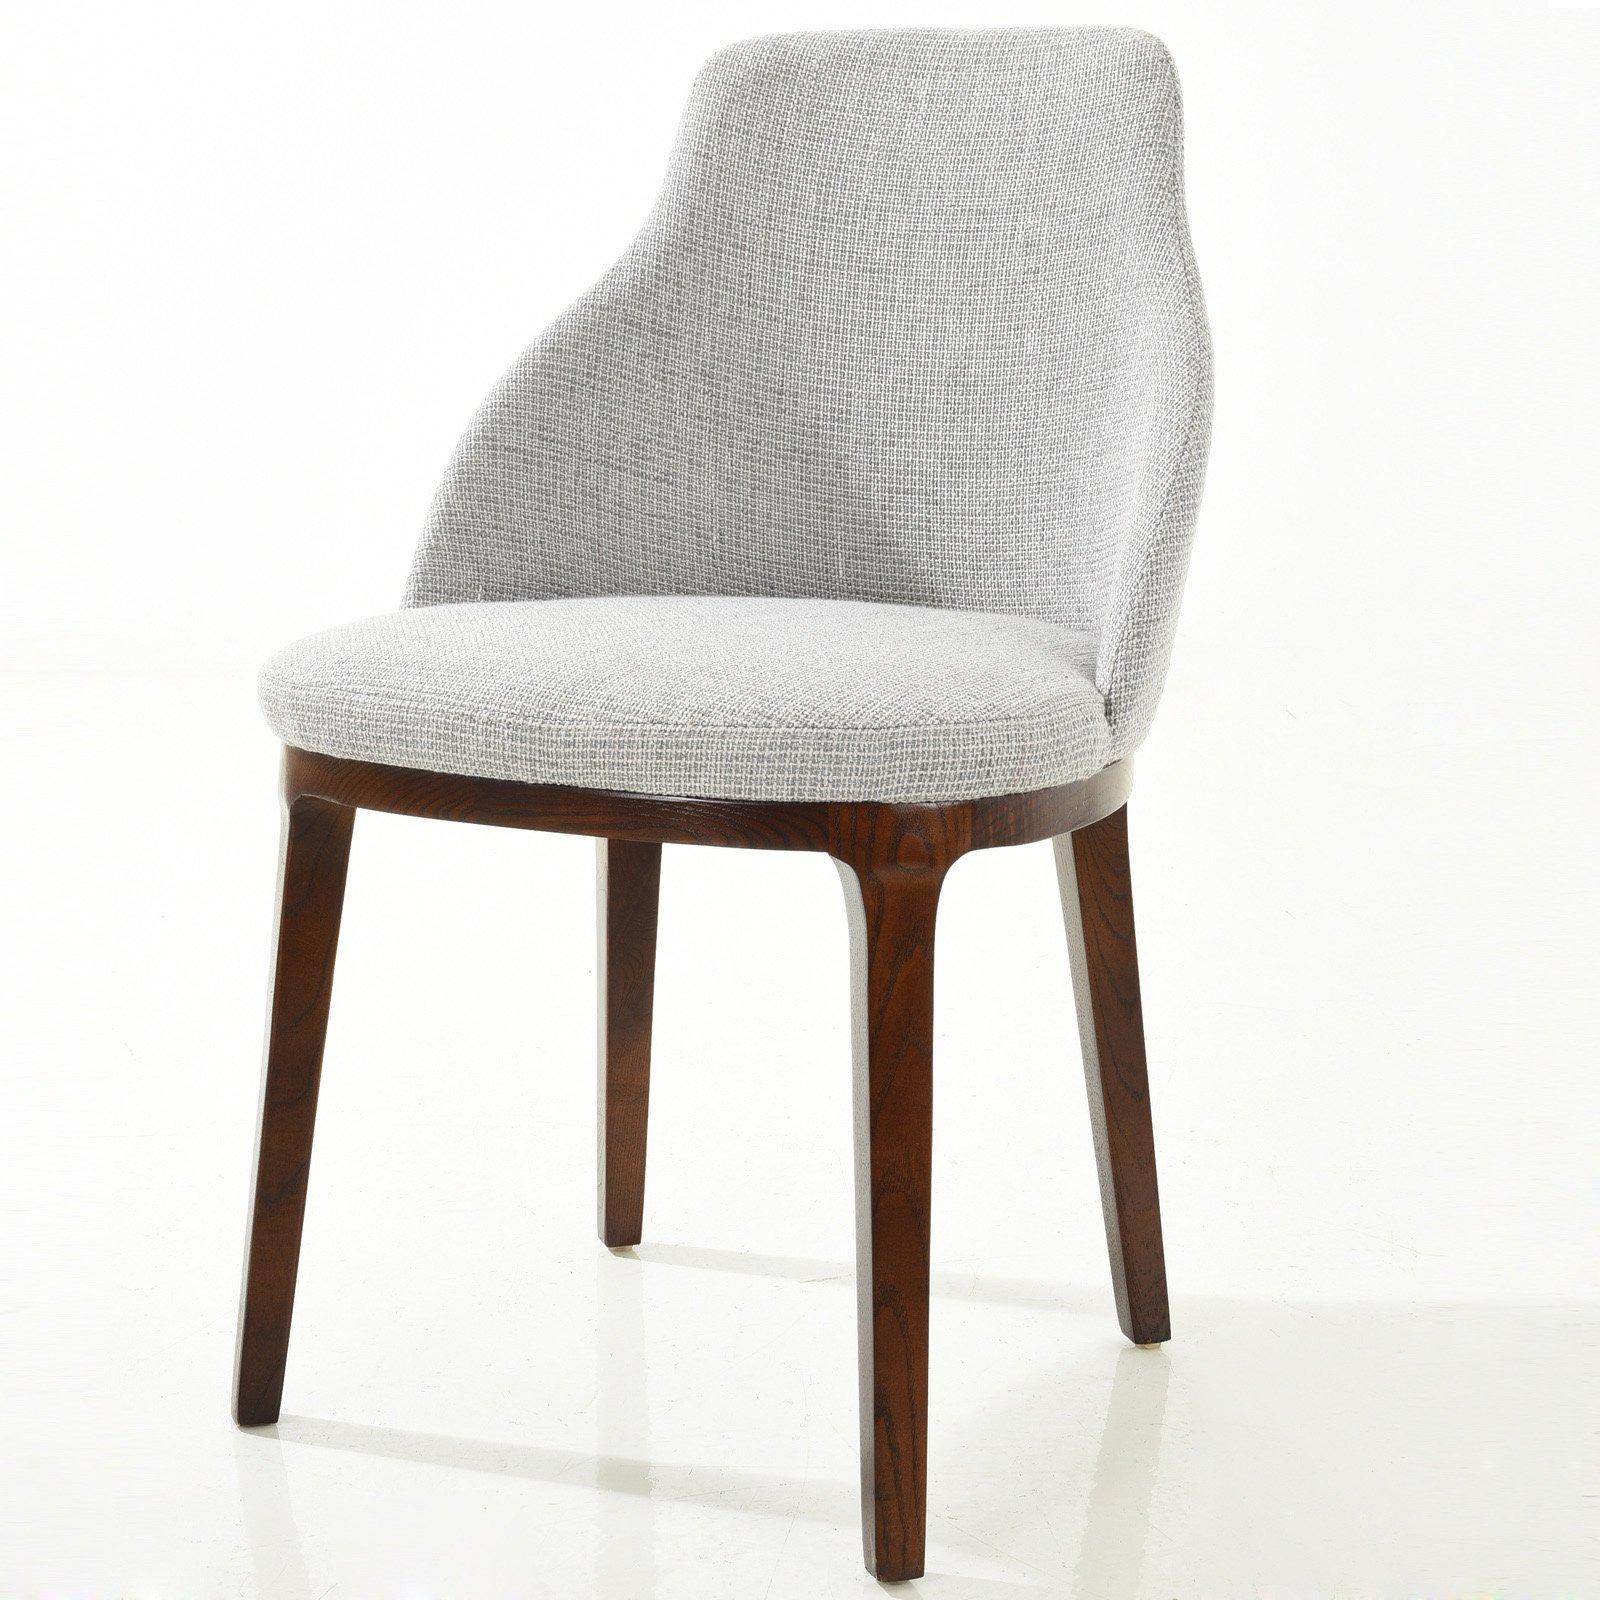 EdgeMod Caroline Dining Chair